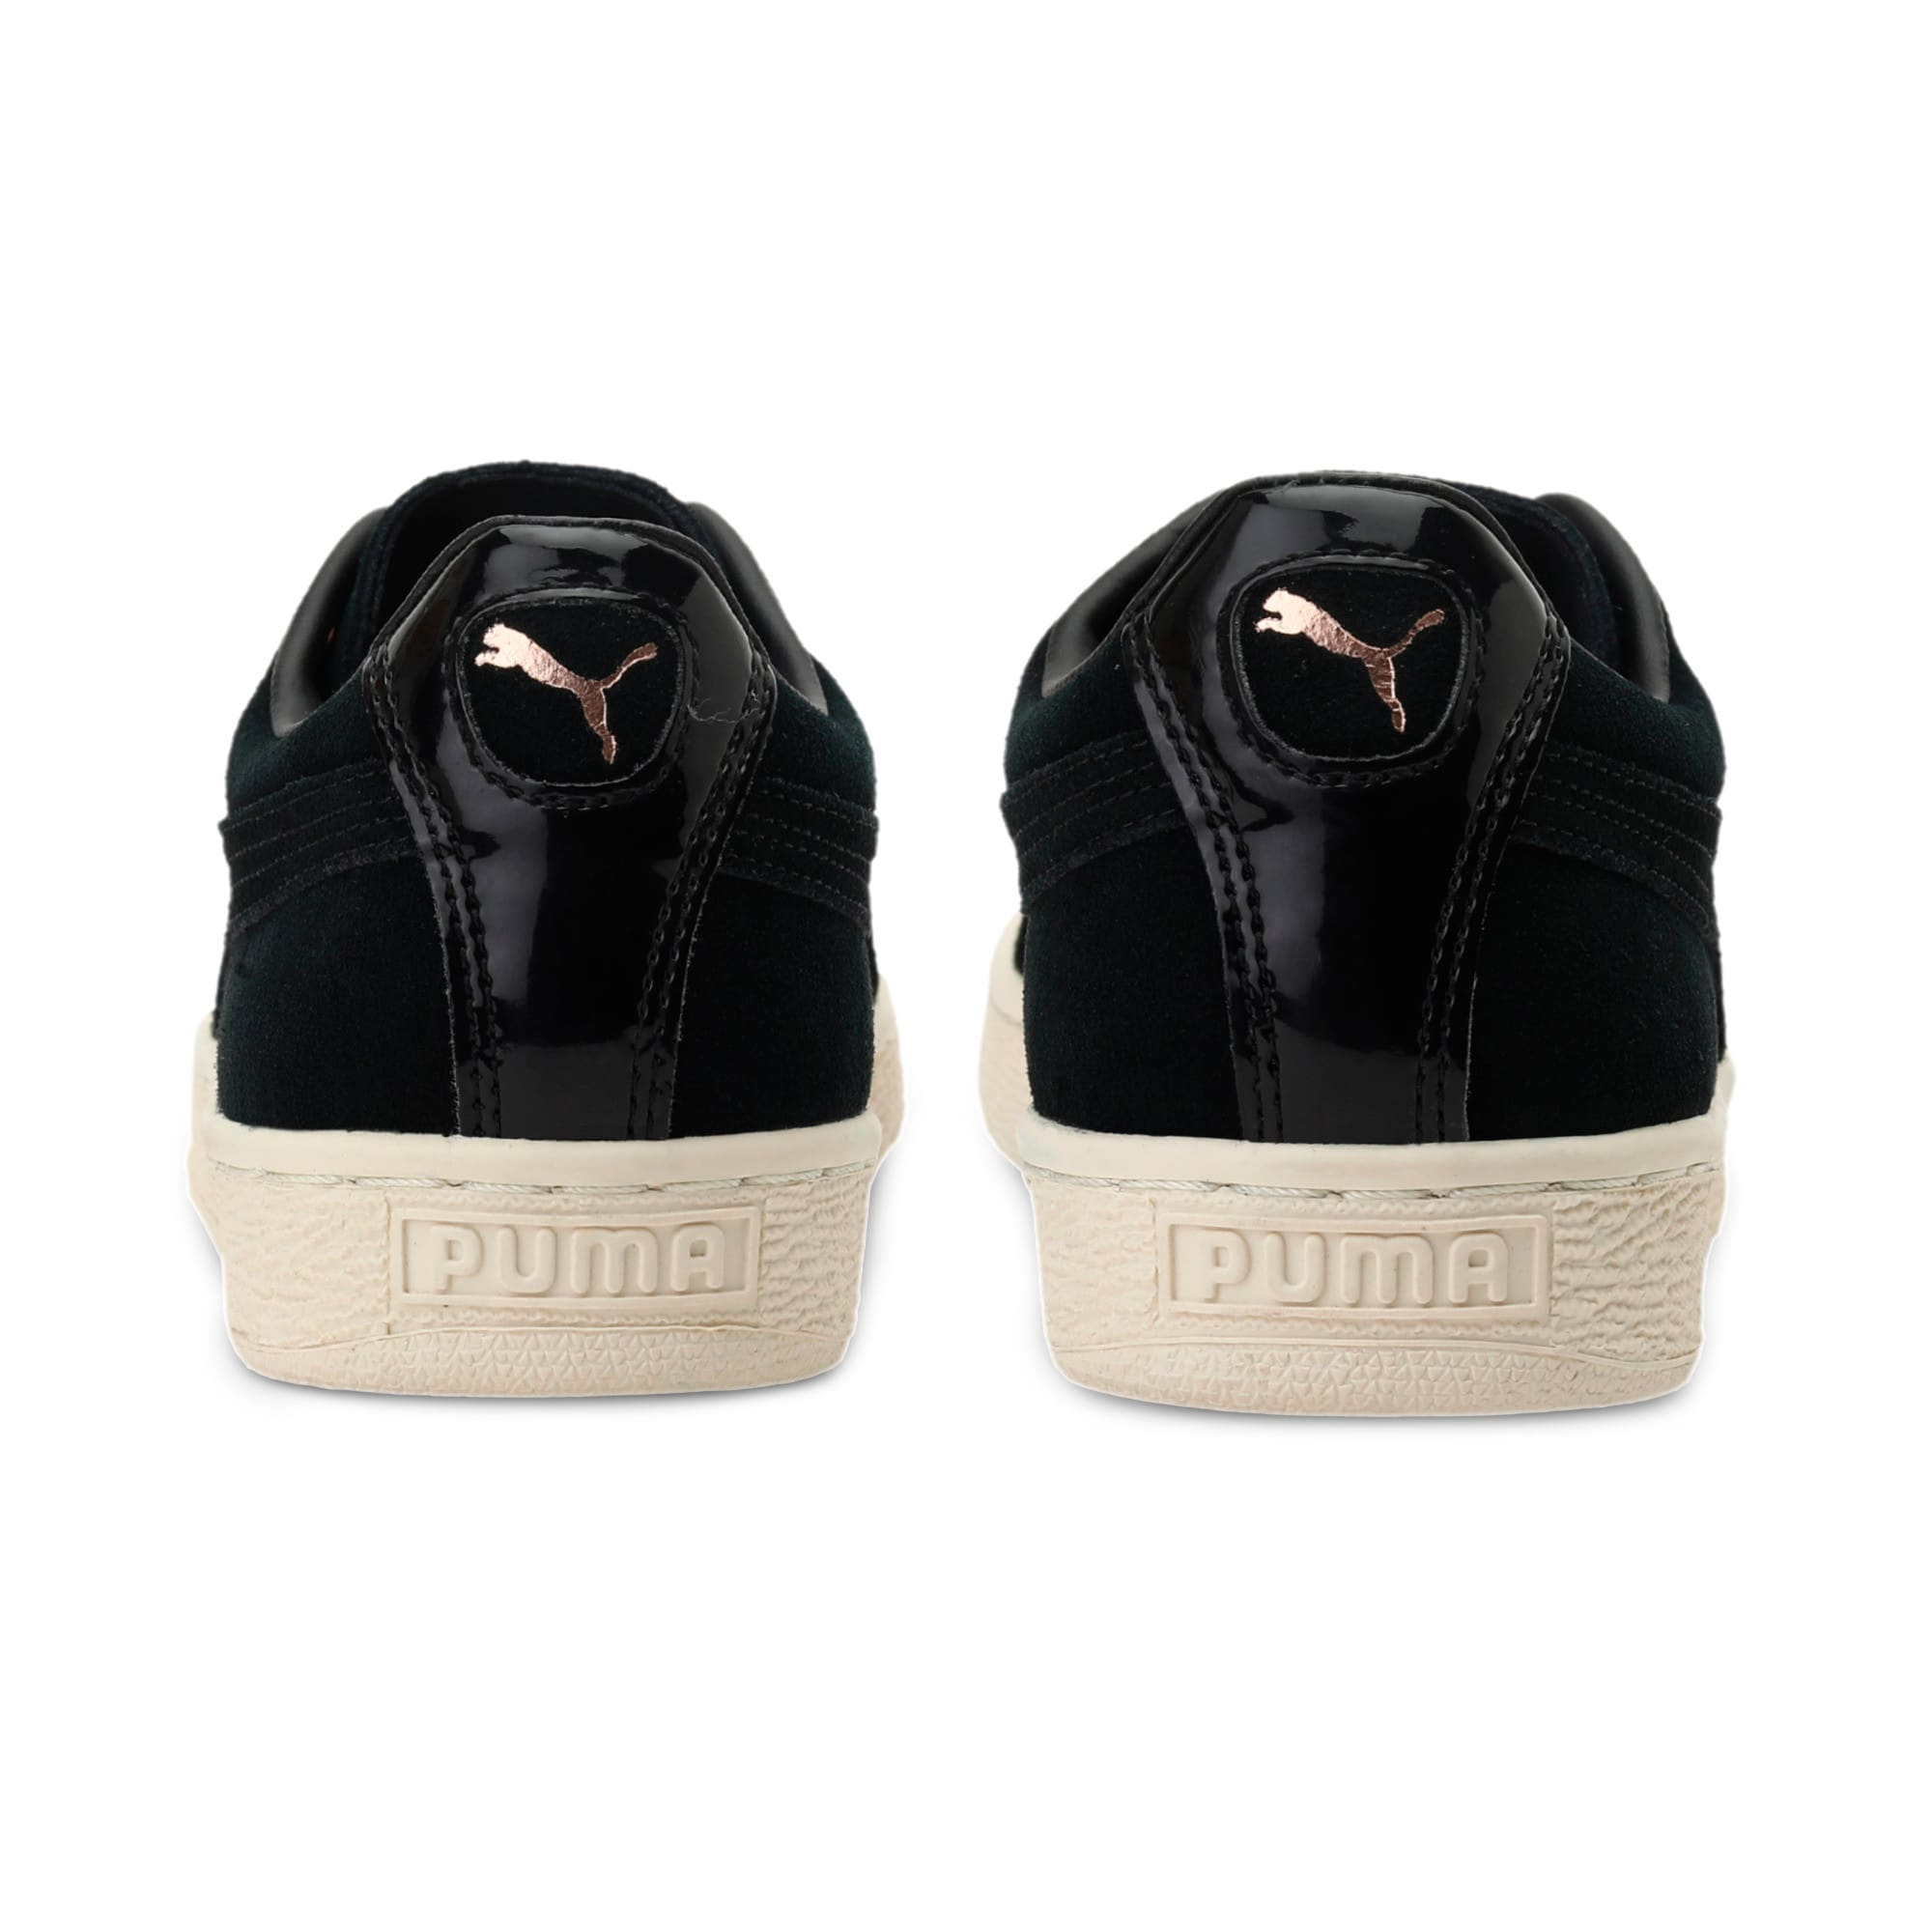 Thumbnail 4 of Suede XL Lace VR Women's Trainers, Puma Black-Puma Black, medium-IND